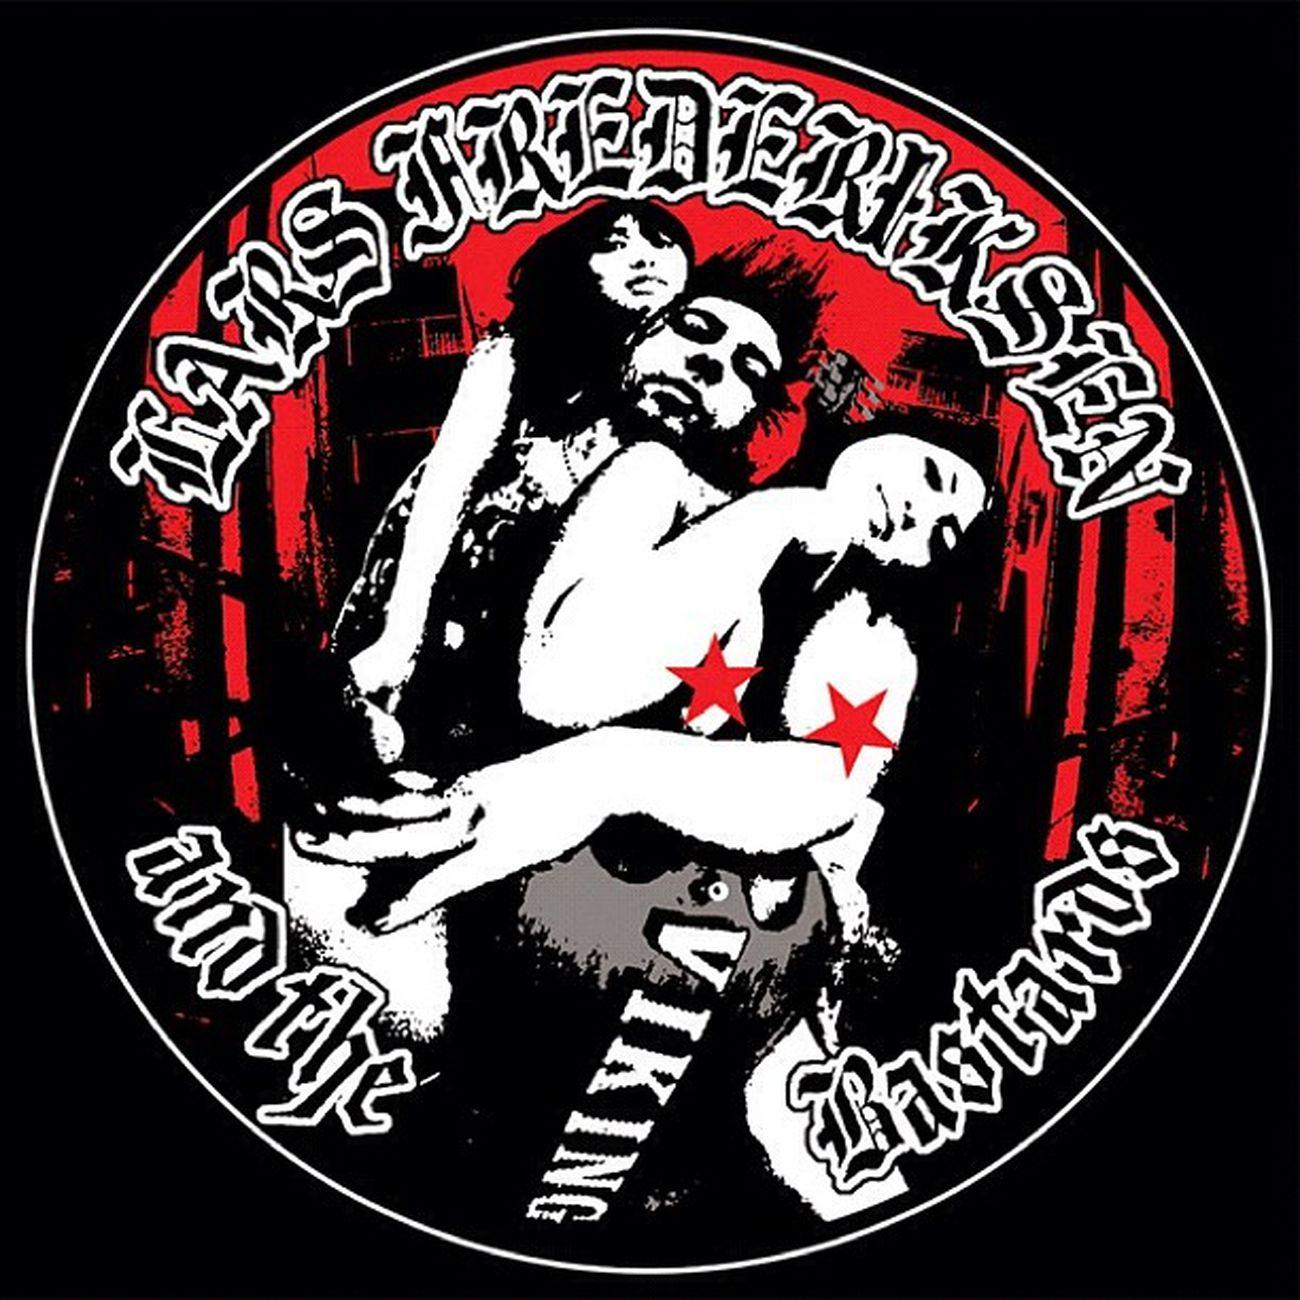 Larsfrederiksen and the Bastards album the Viking